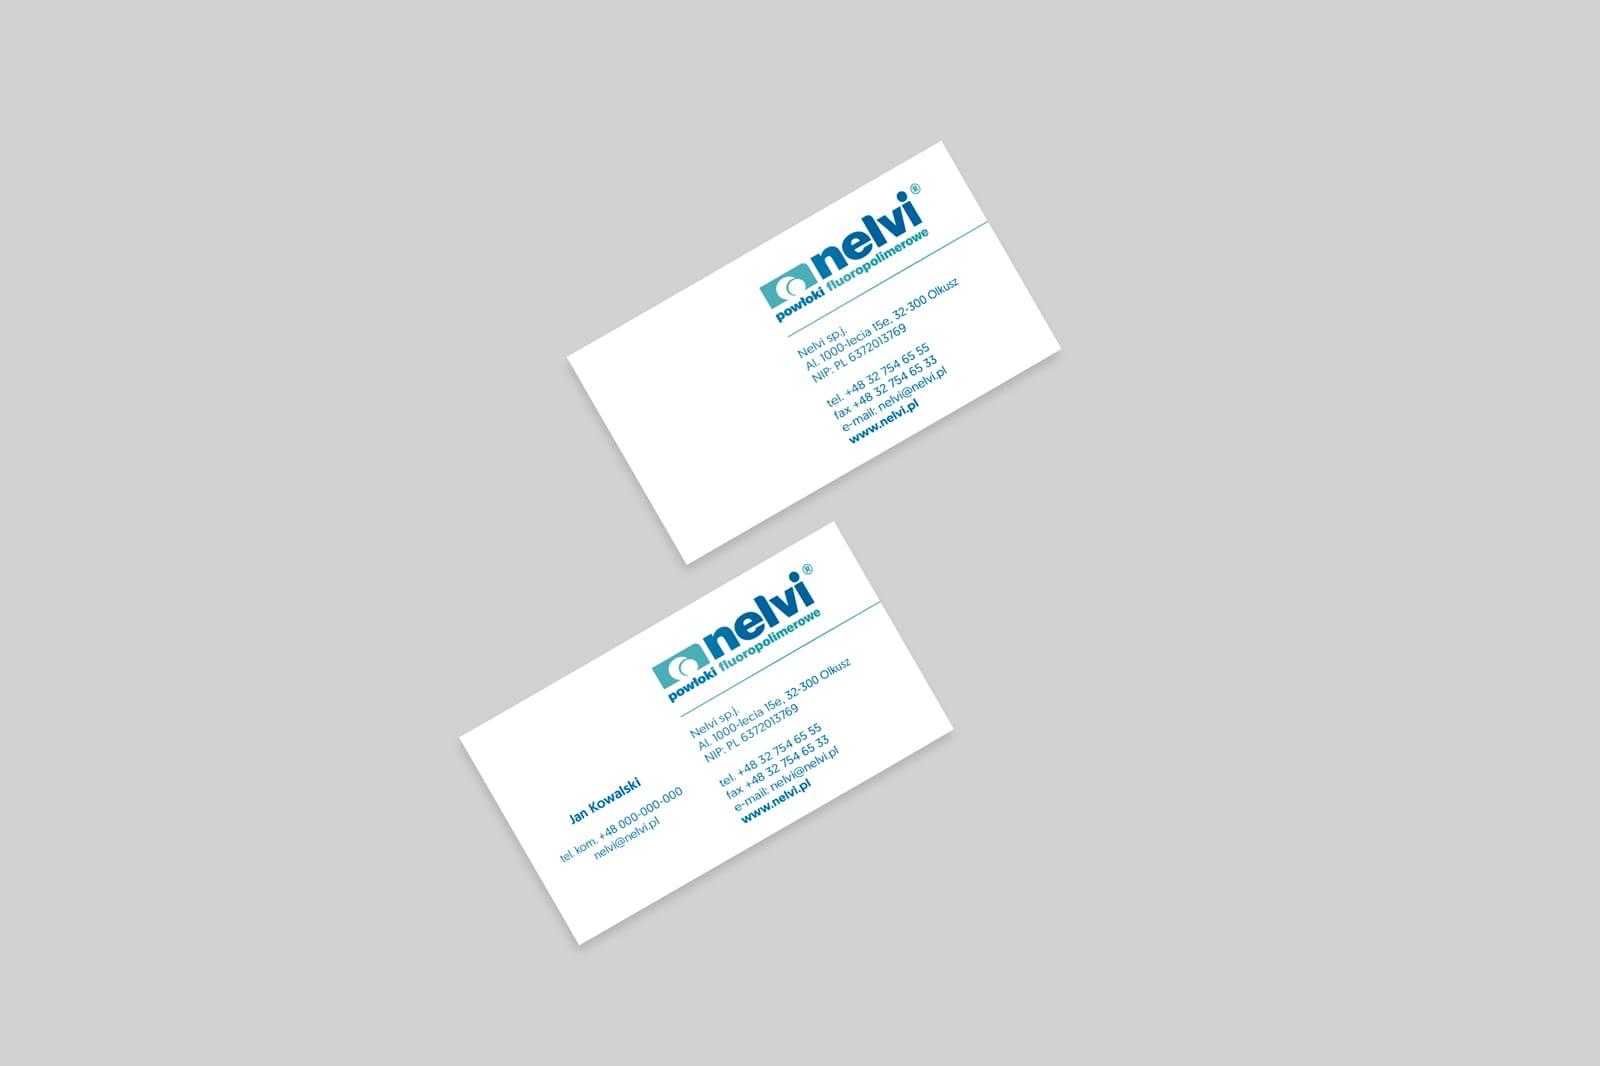 Nelvi identyfikacja wizualna branding Agencja brandingowa Moweli Creative